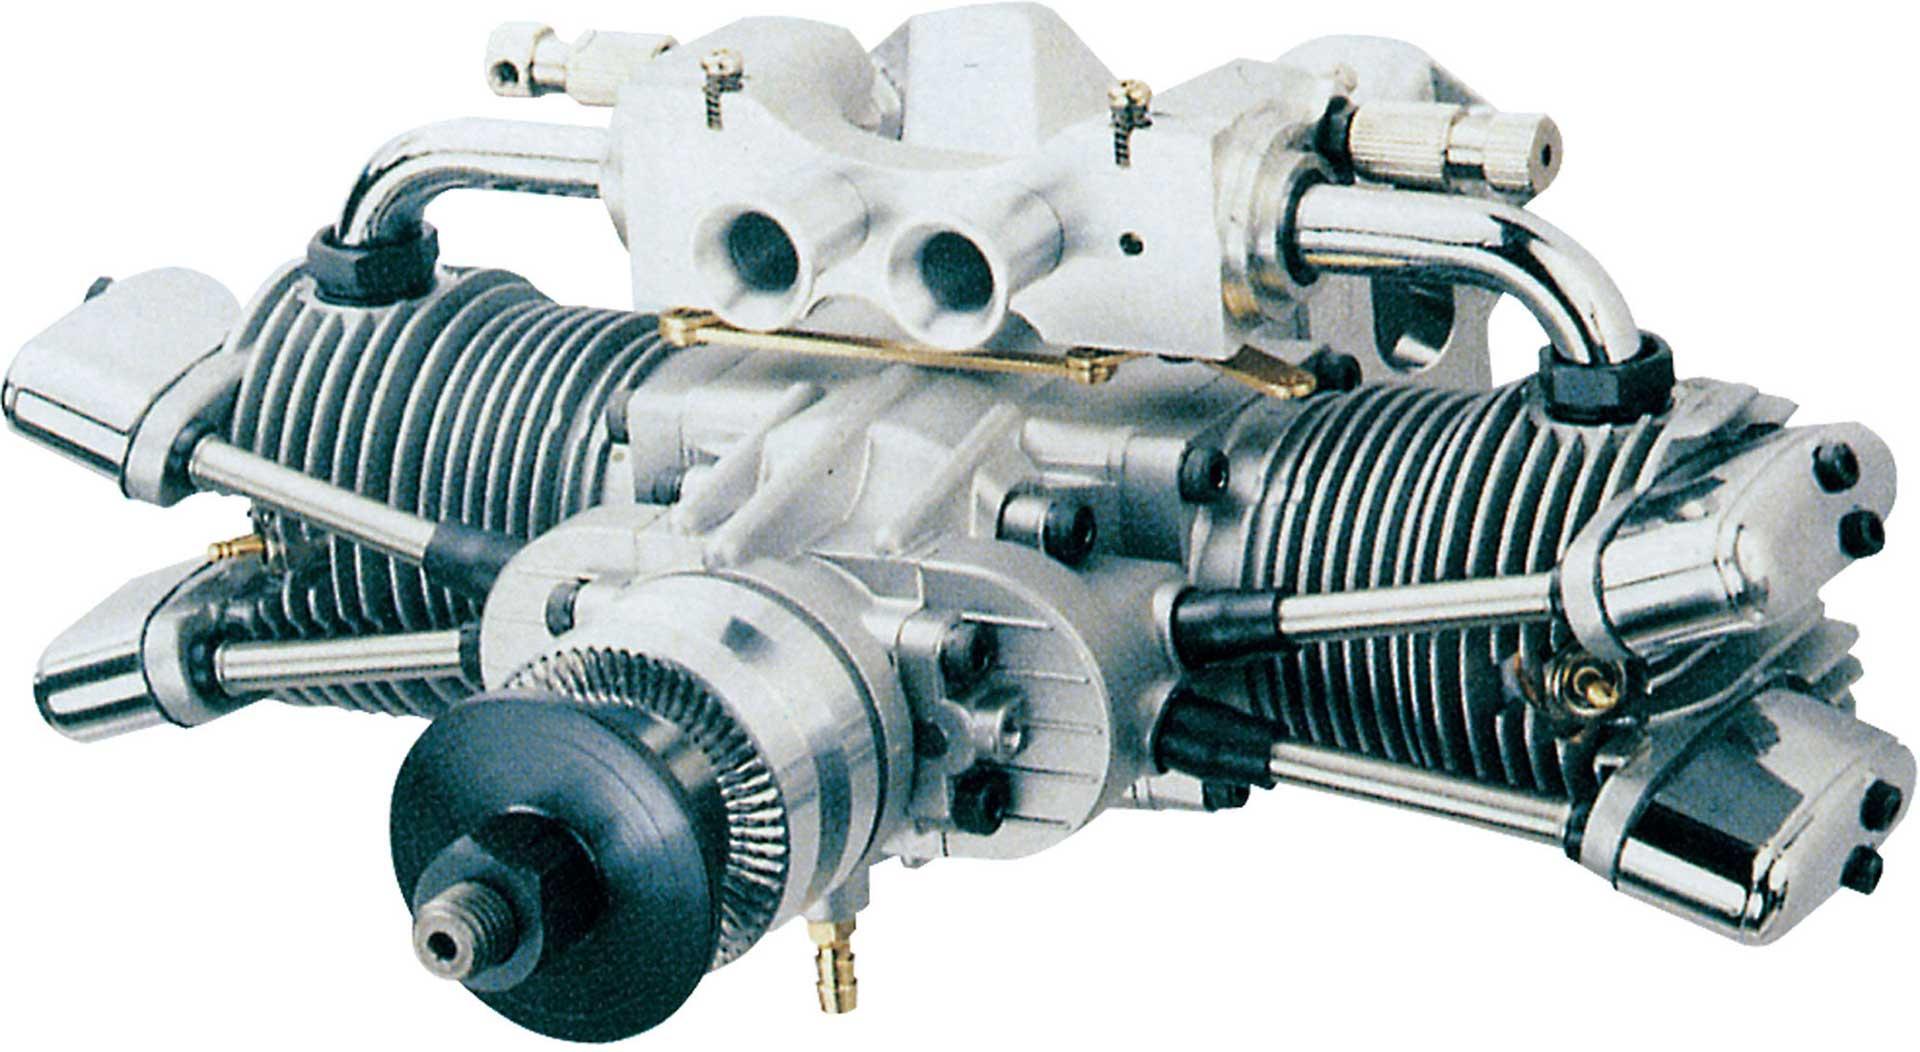 SAITO FA-182TD 2-CYLINDER ENGINE